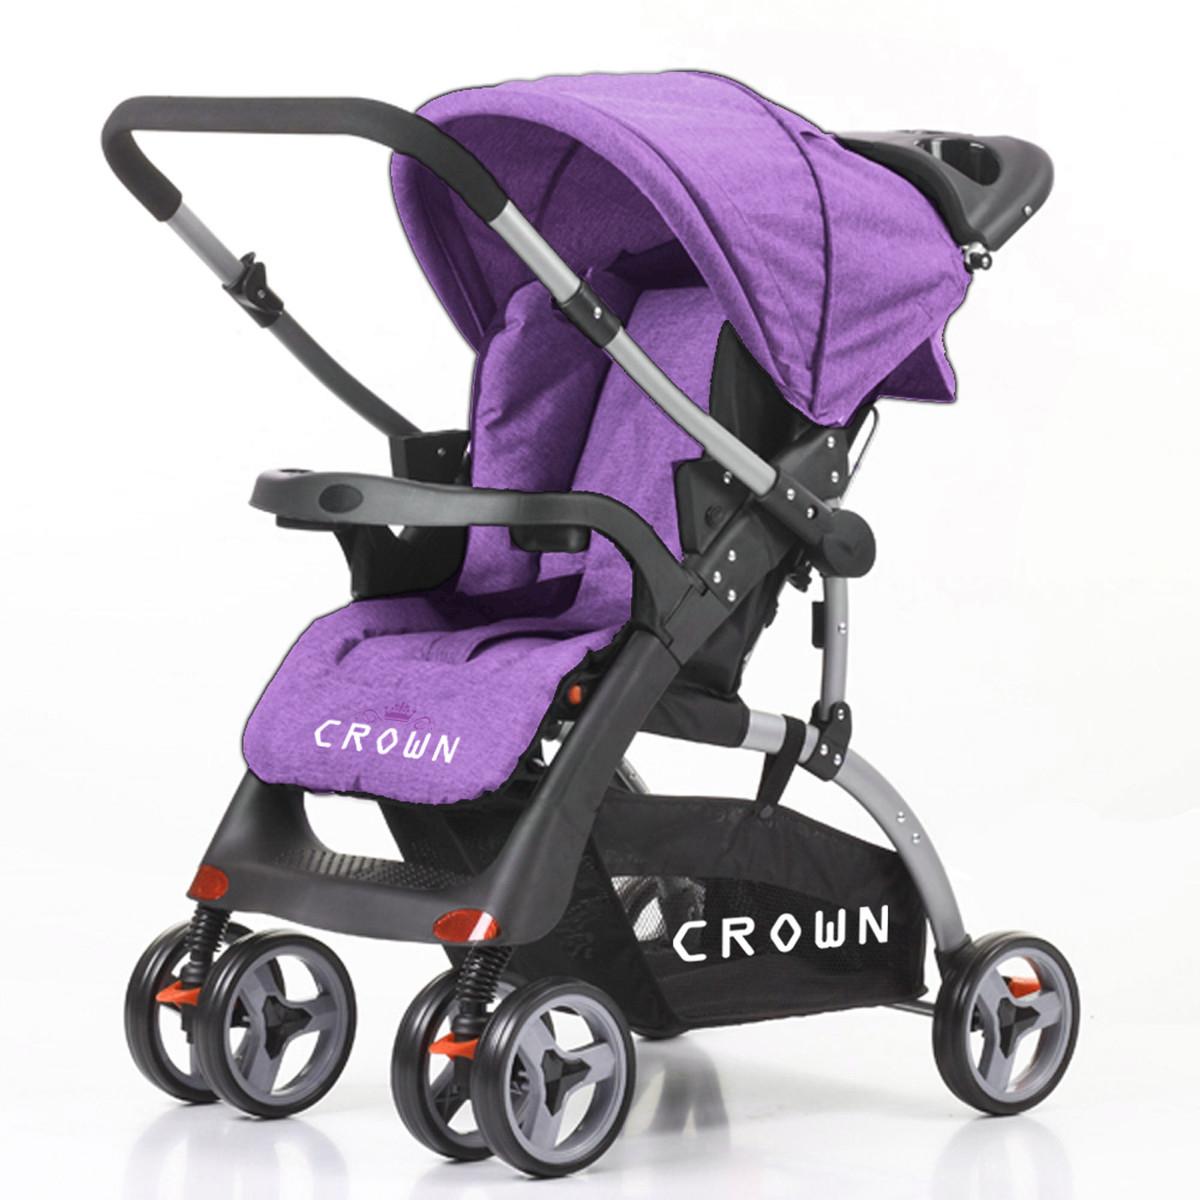 CROWN ST530 Buggy Kinderwagen DUAL-WAY Purple